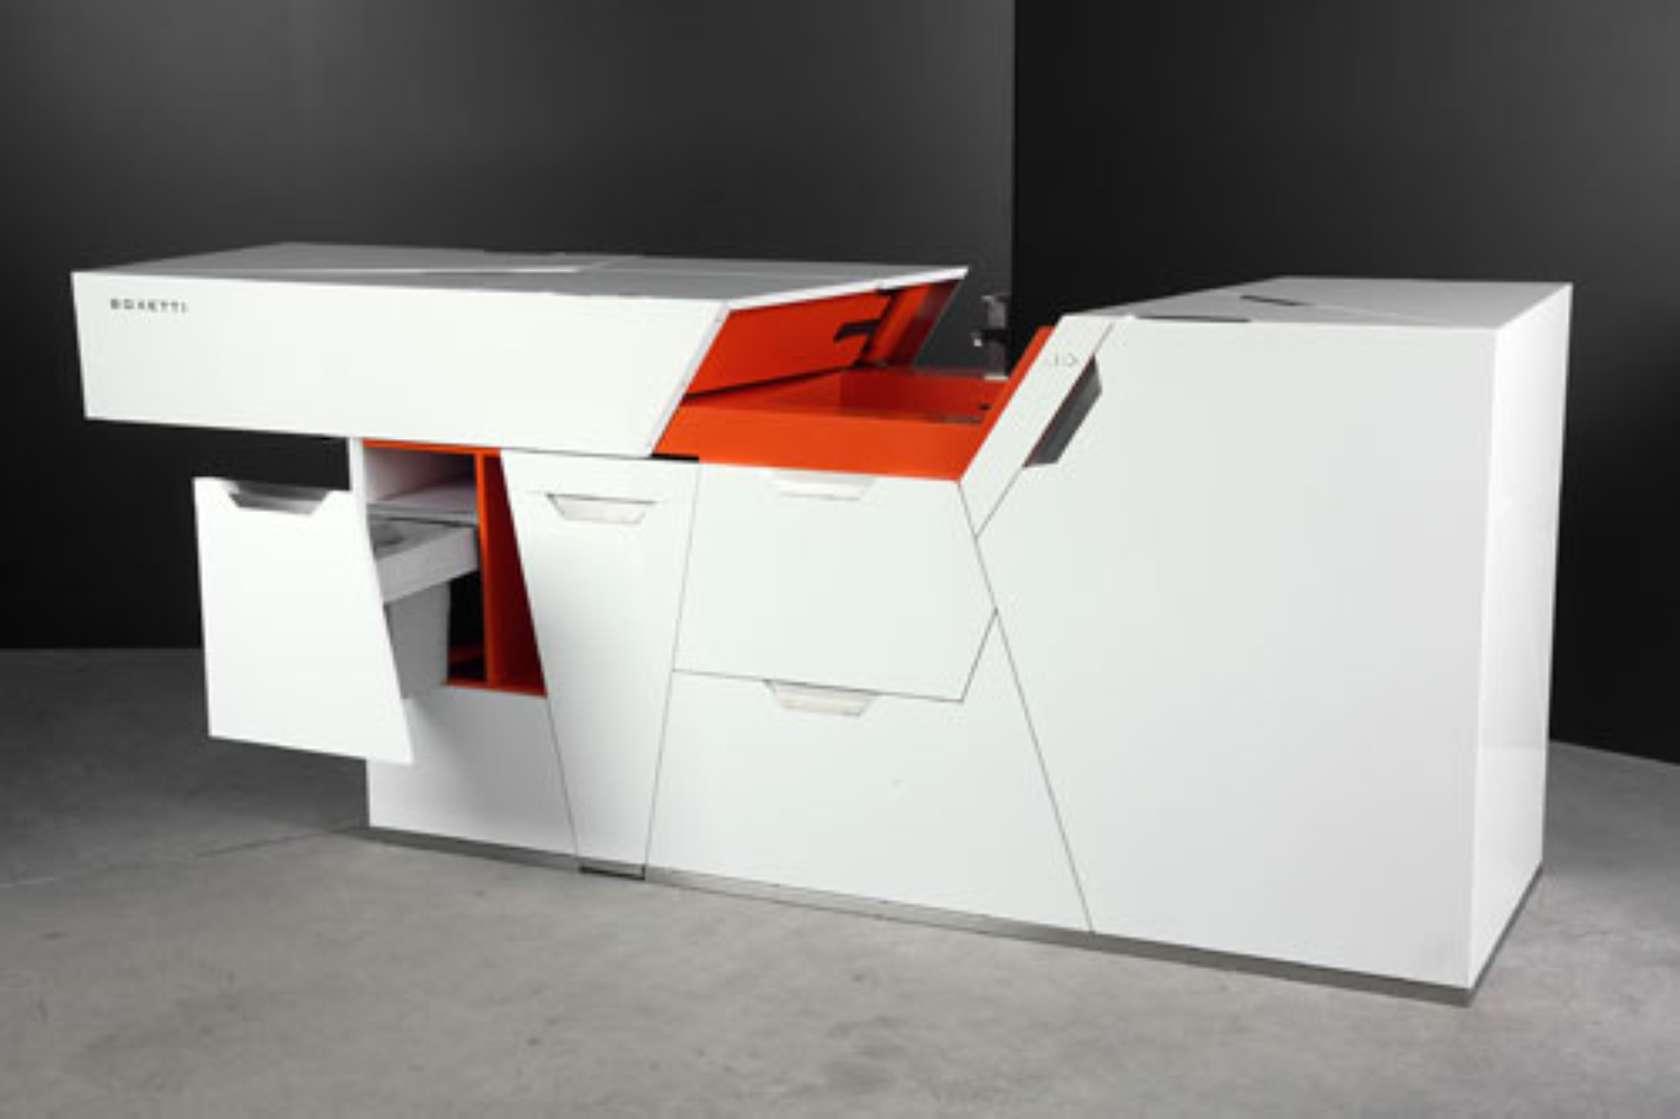 Ideas De Decoraci N 11 Muebles Que Molan Mucho Pero Que Jam S  # Muebles Boxetti